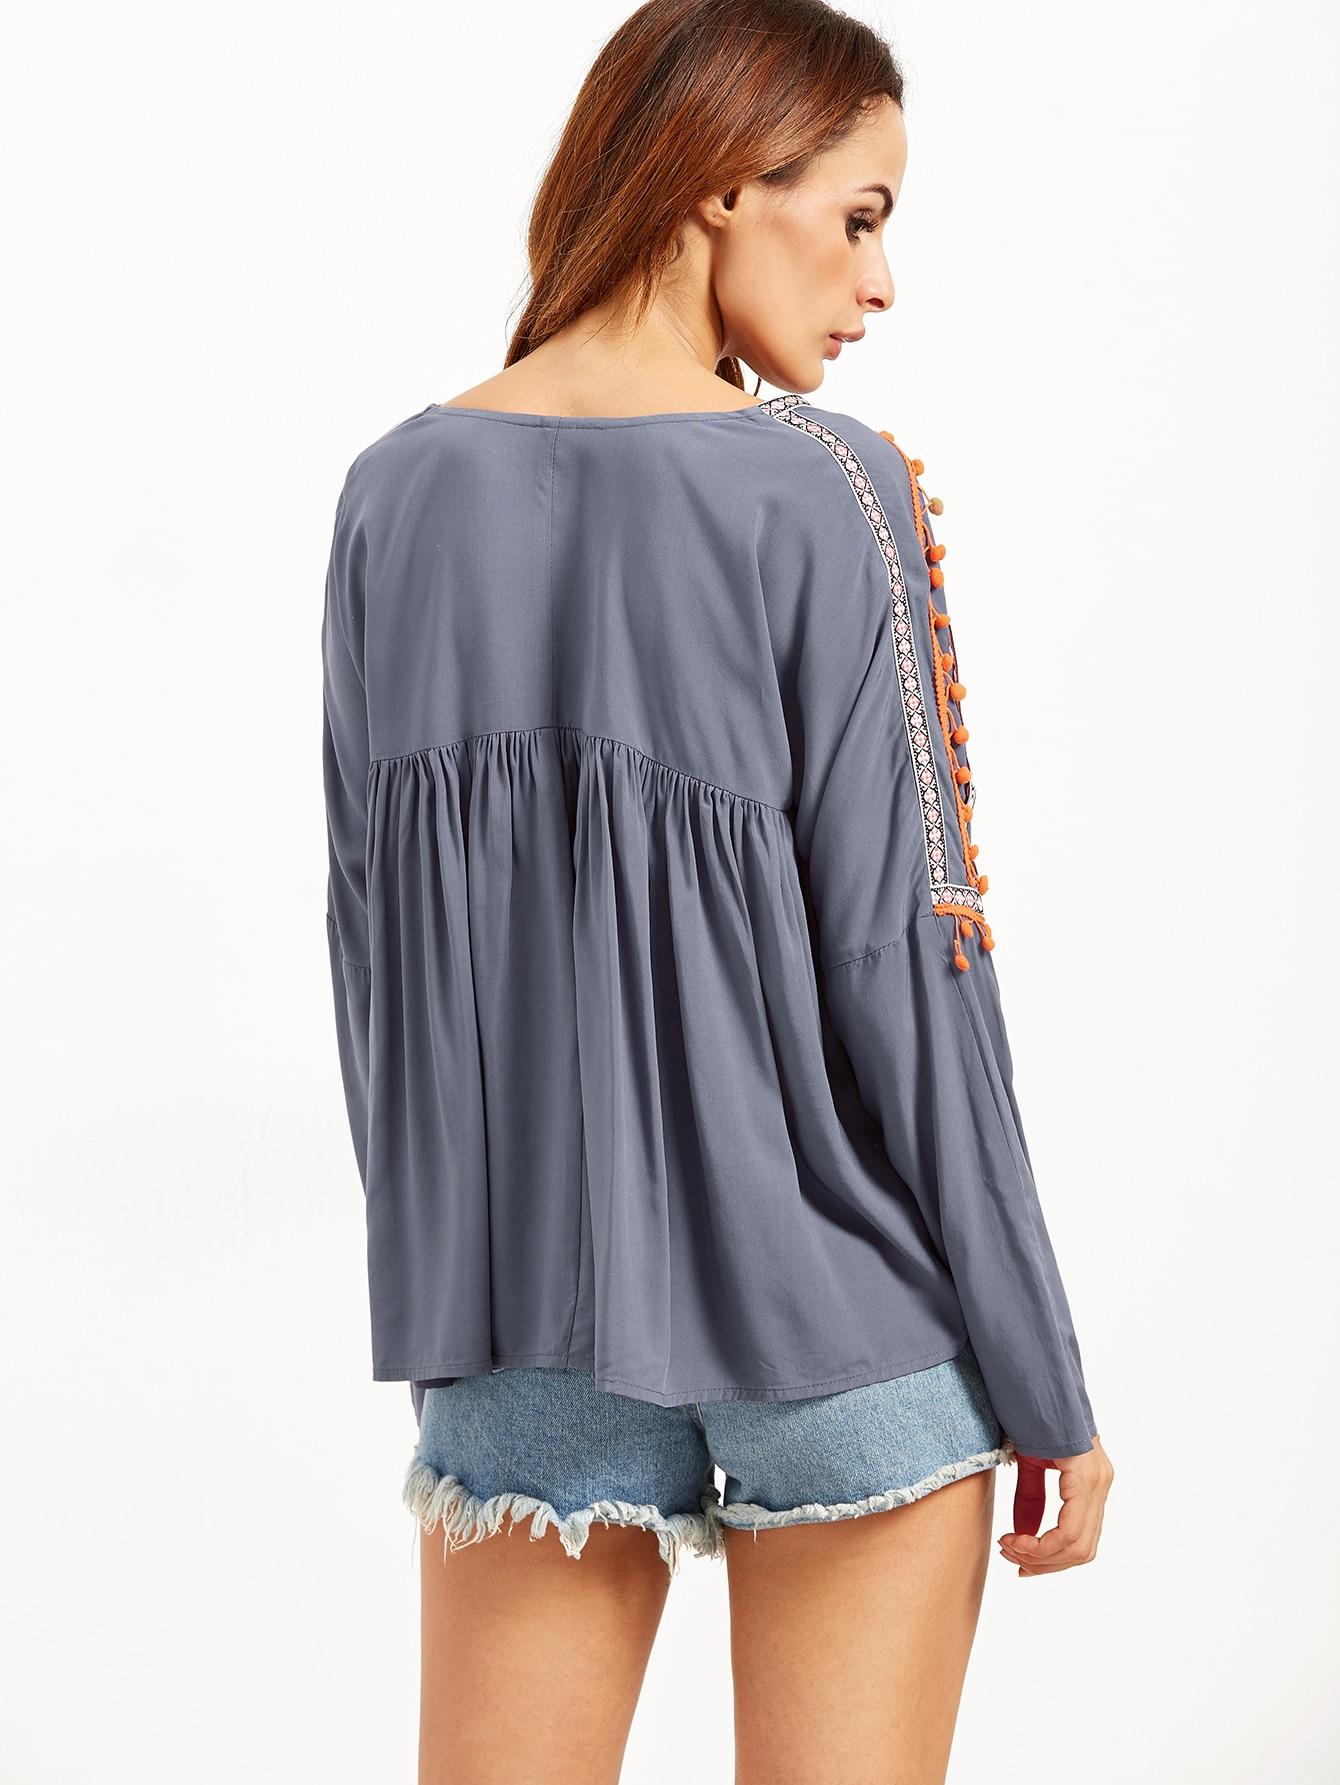 blouse160901501_2